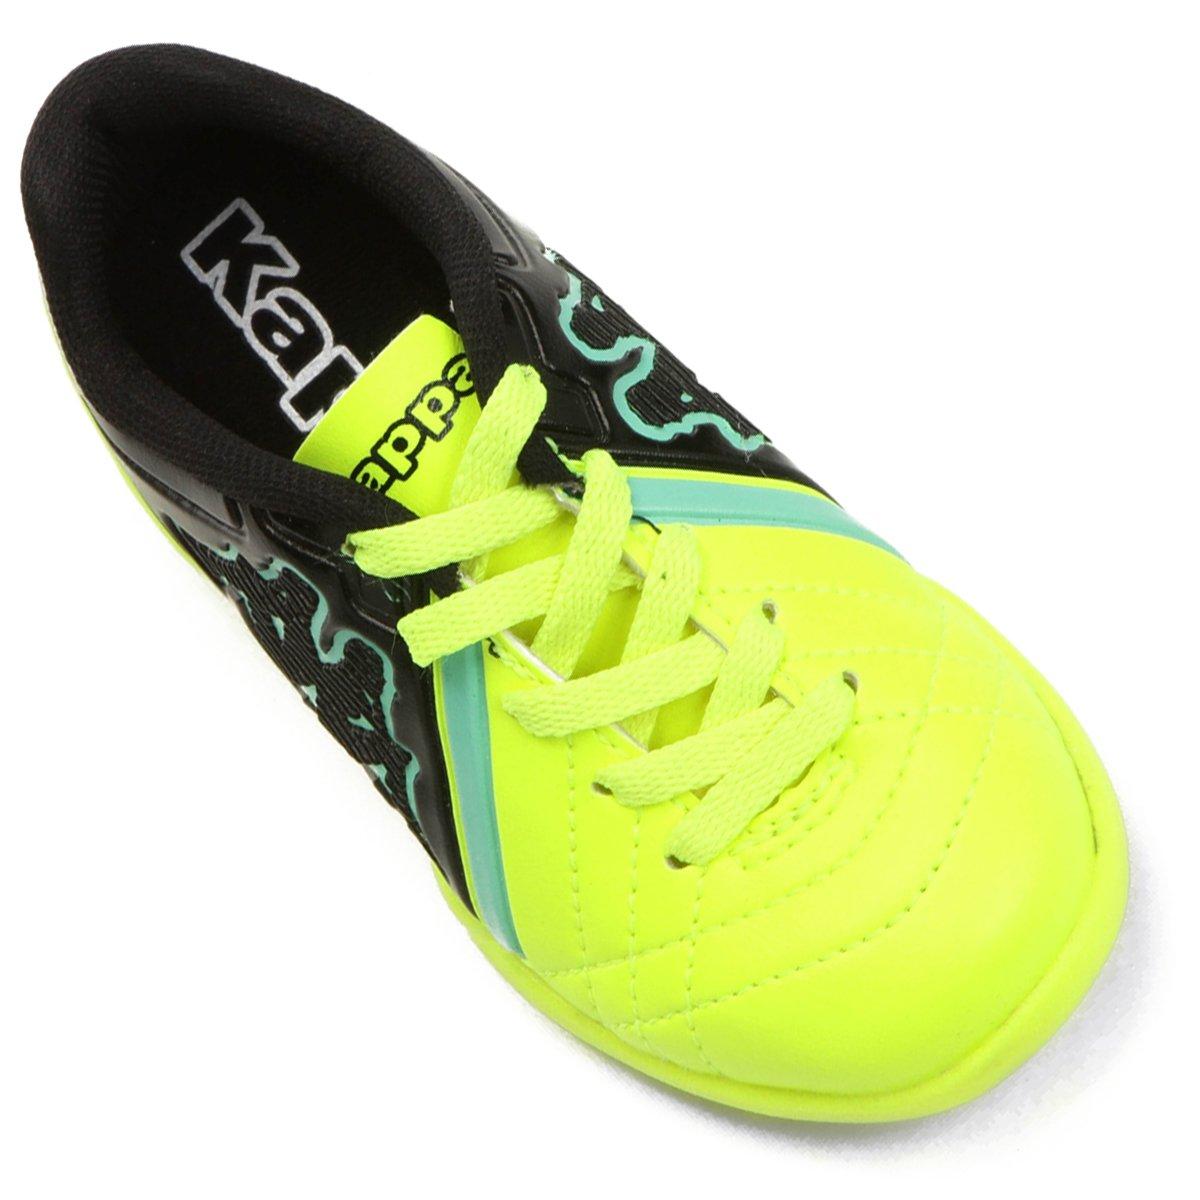 Chuteira Futsal Infantil Kappa Avanti - Verde Limão e Preto 1c46229ccd4be